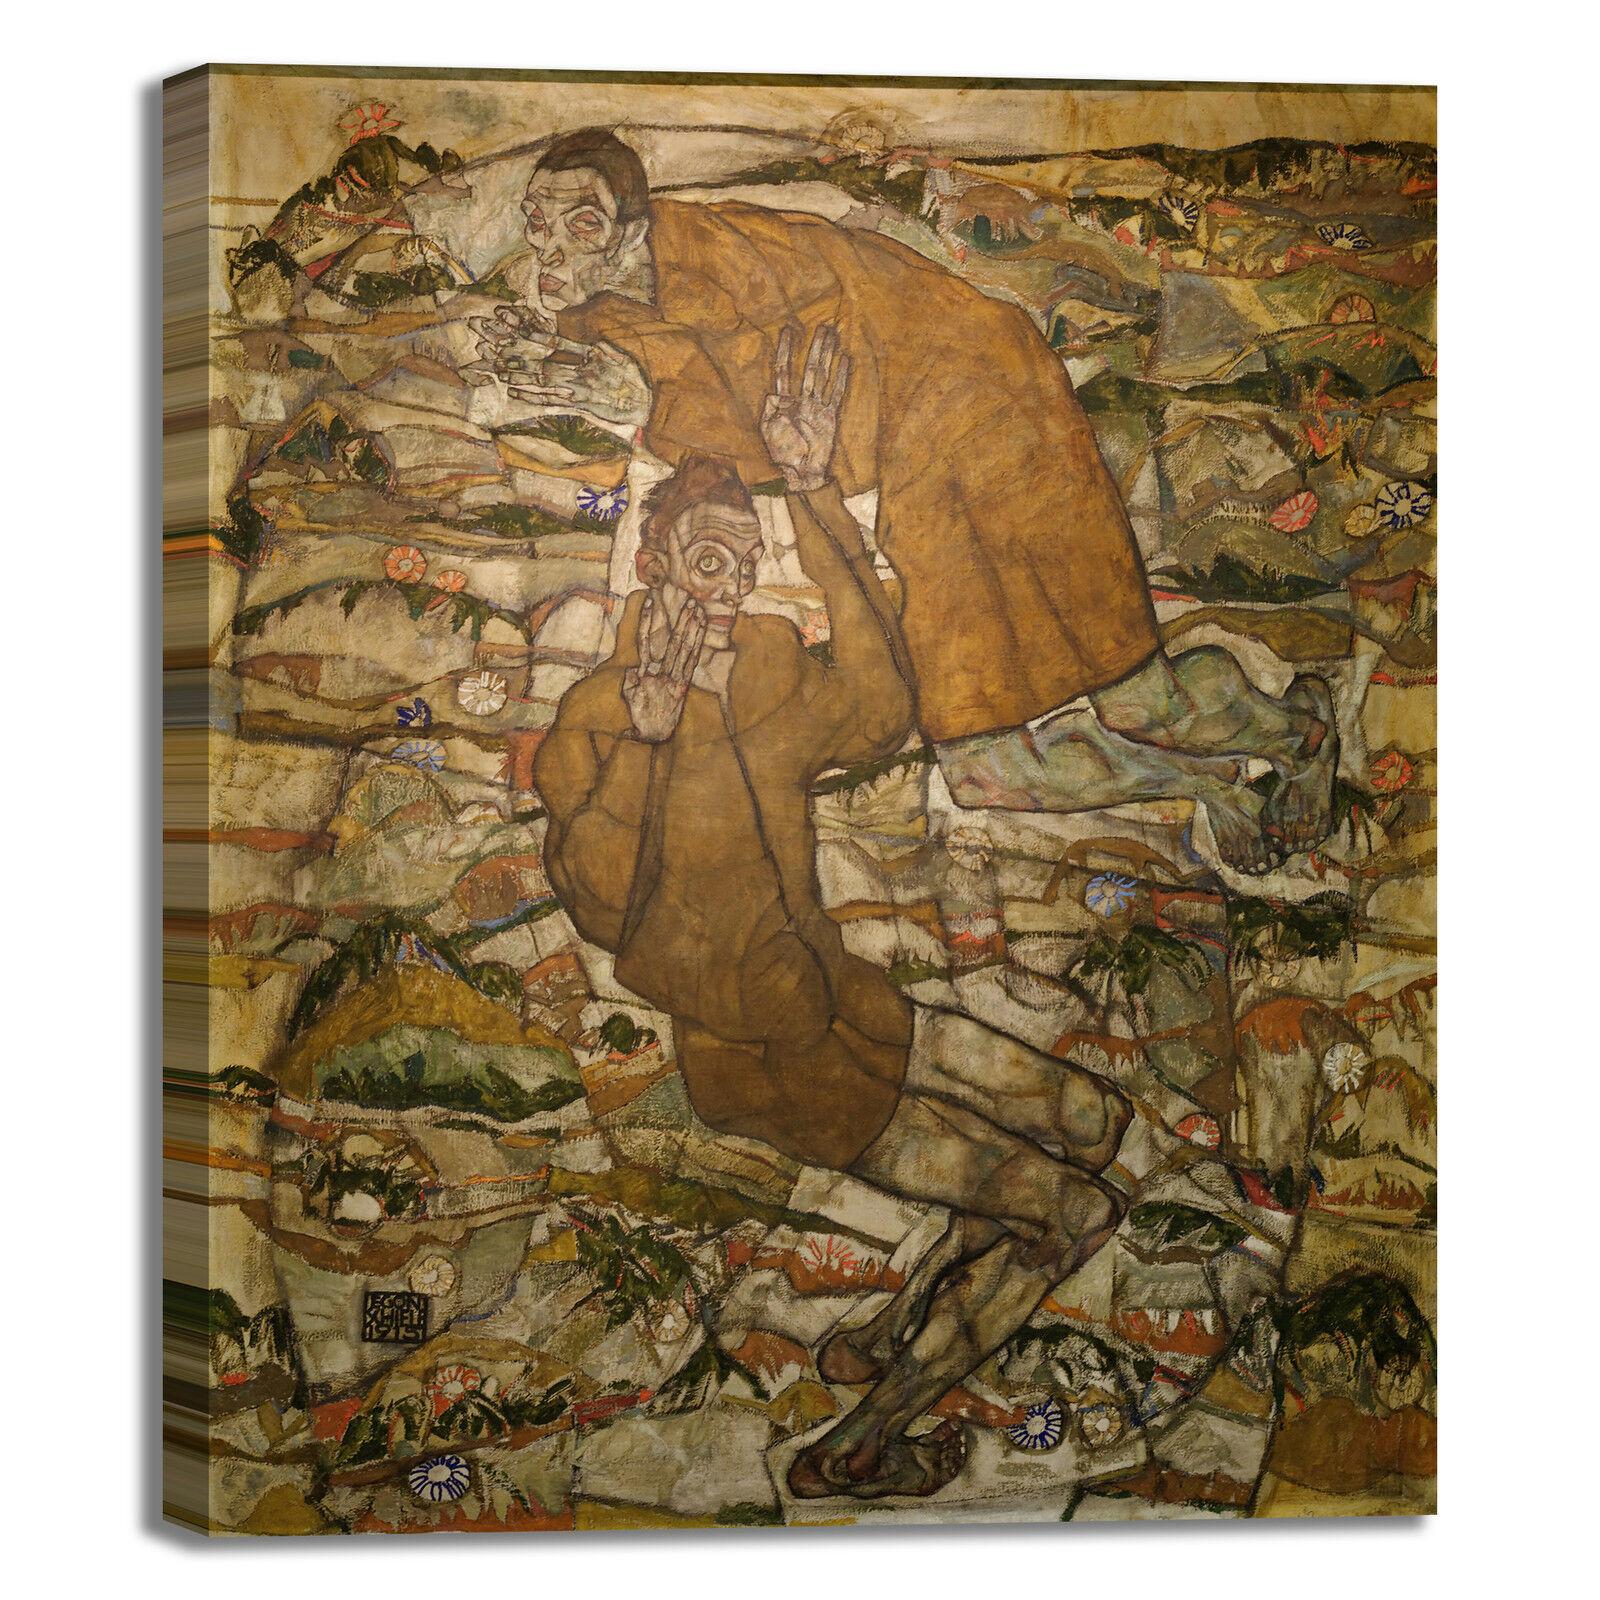 Schiele levitazione design quadro stampa dipinto tela dipinto stampa telaio arRouge o casa e3d193